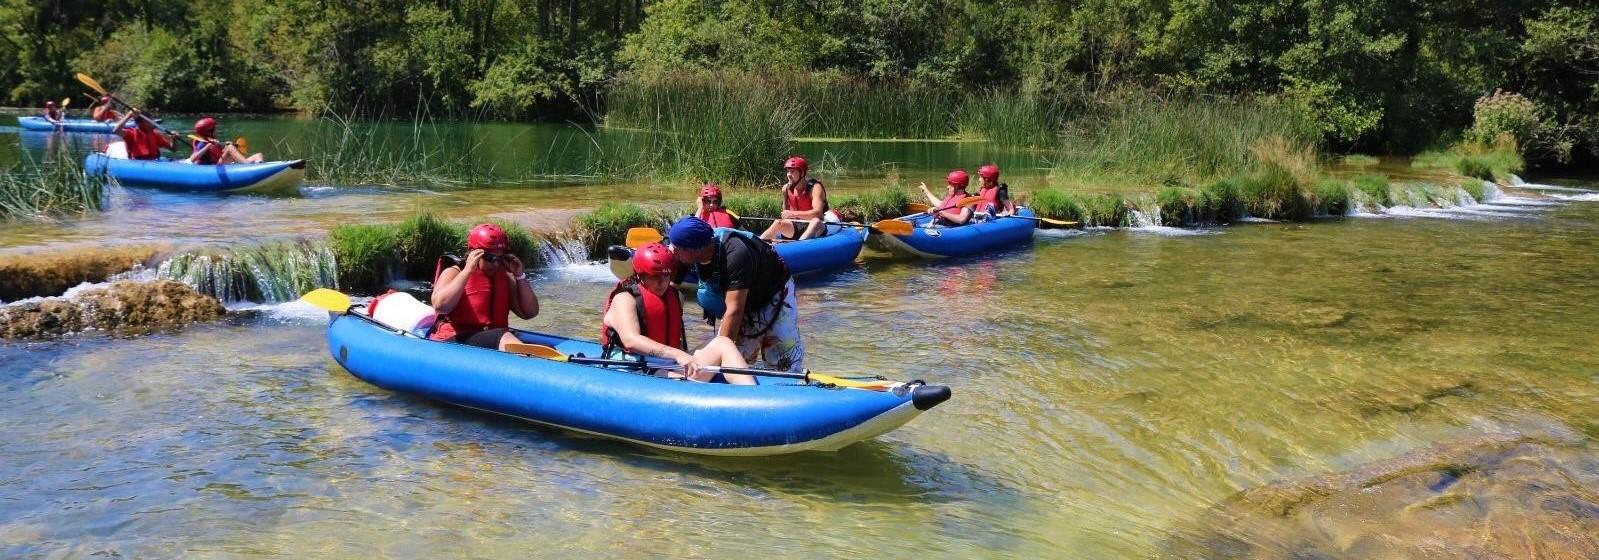 Plitvice Lakes and Kayak Break